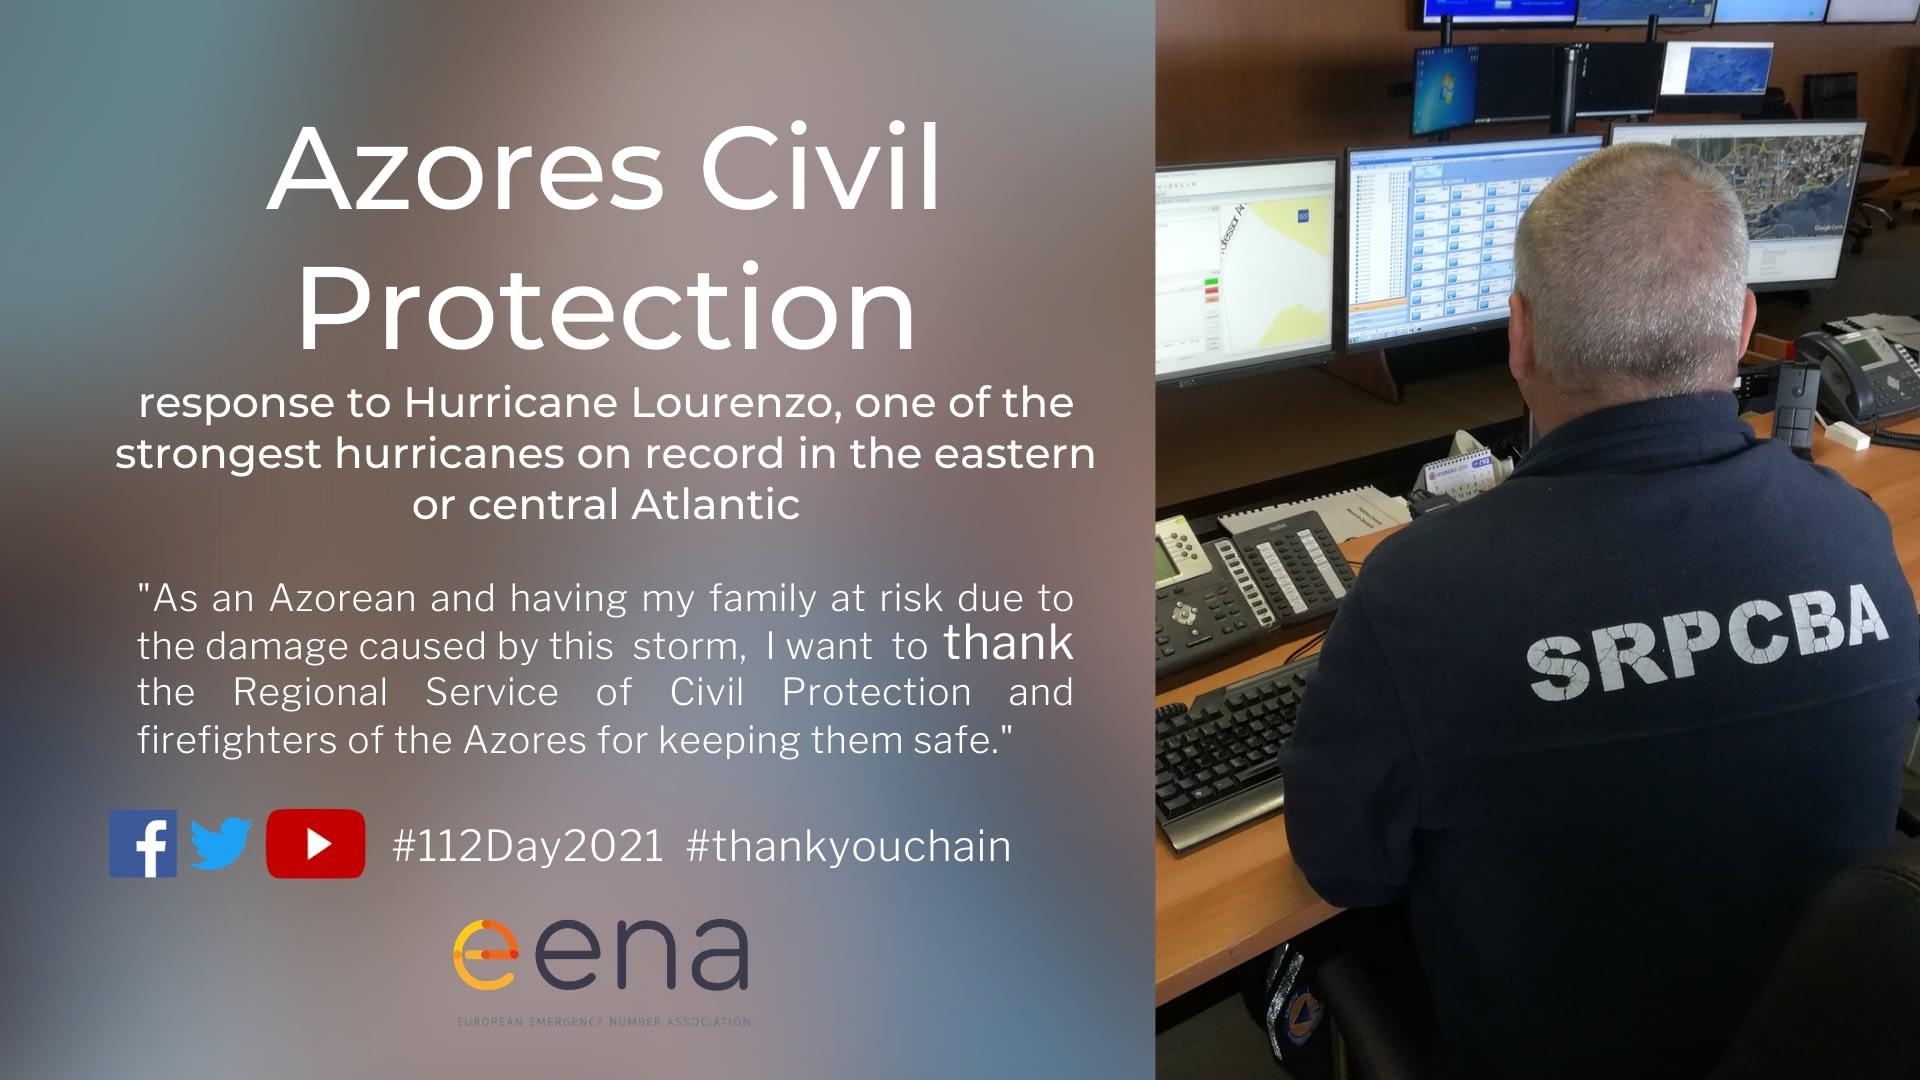 Citizen thanks the Azores Civil Protection